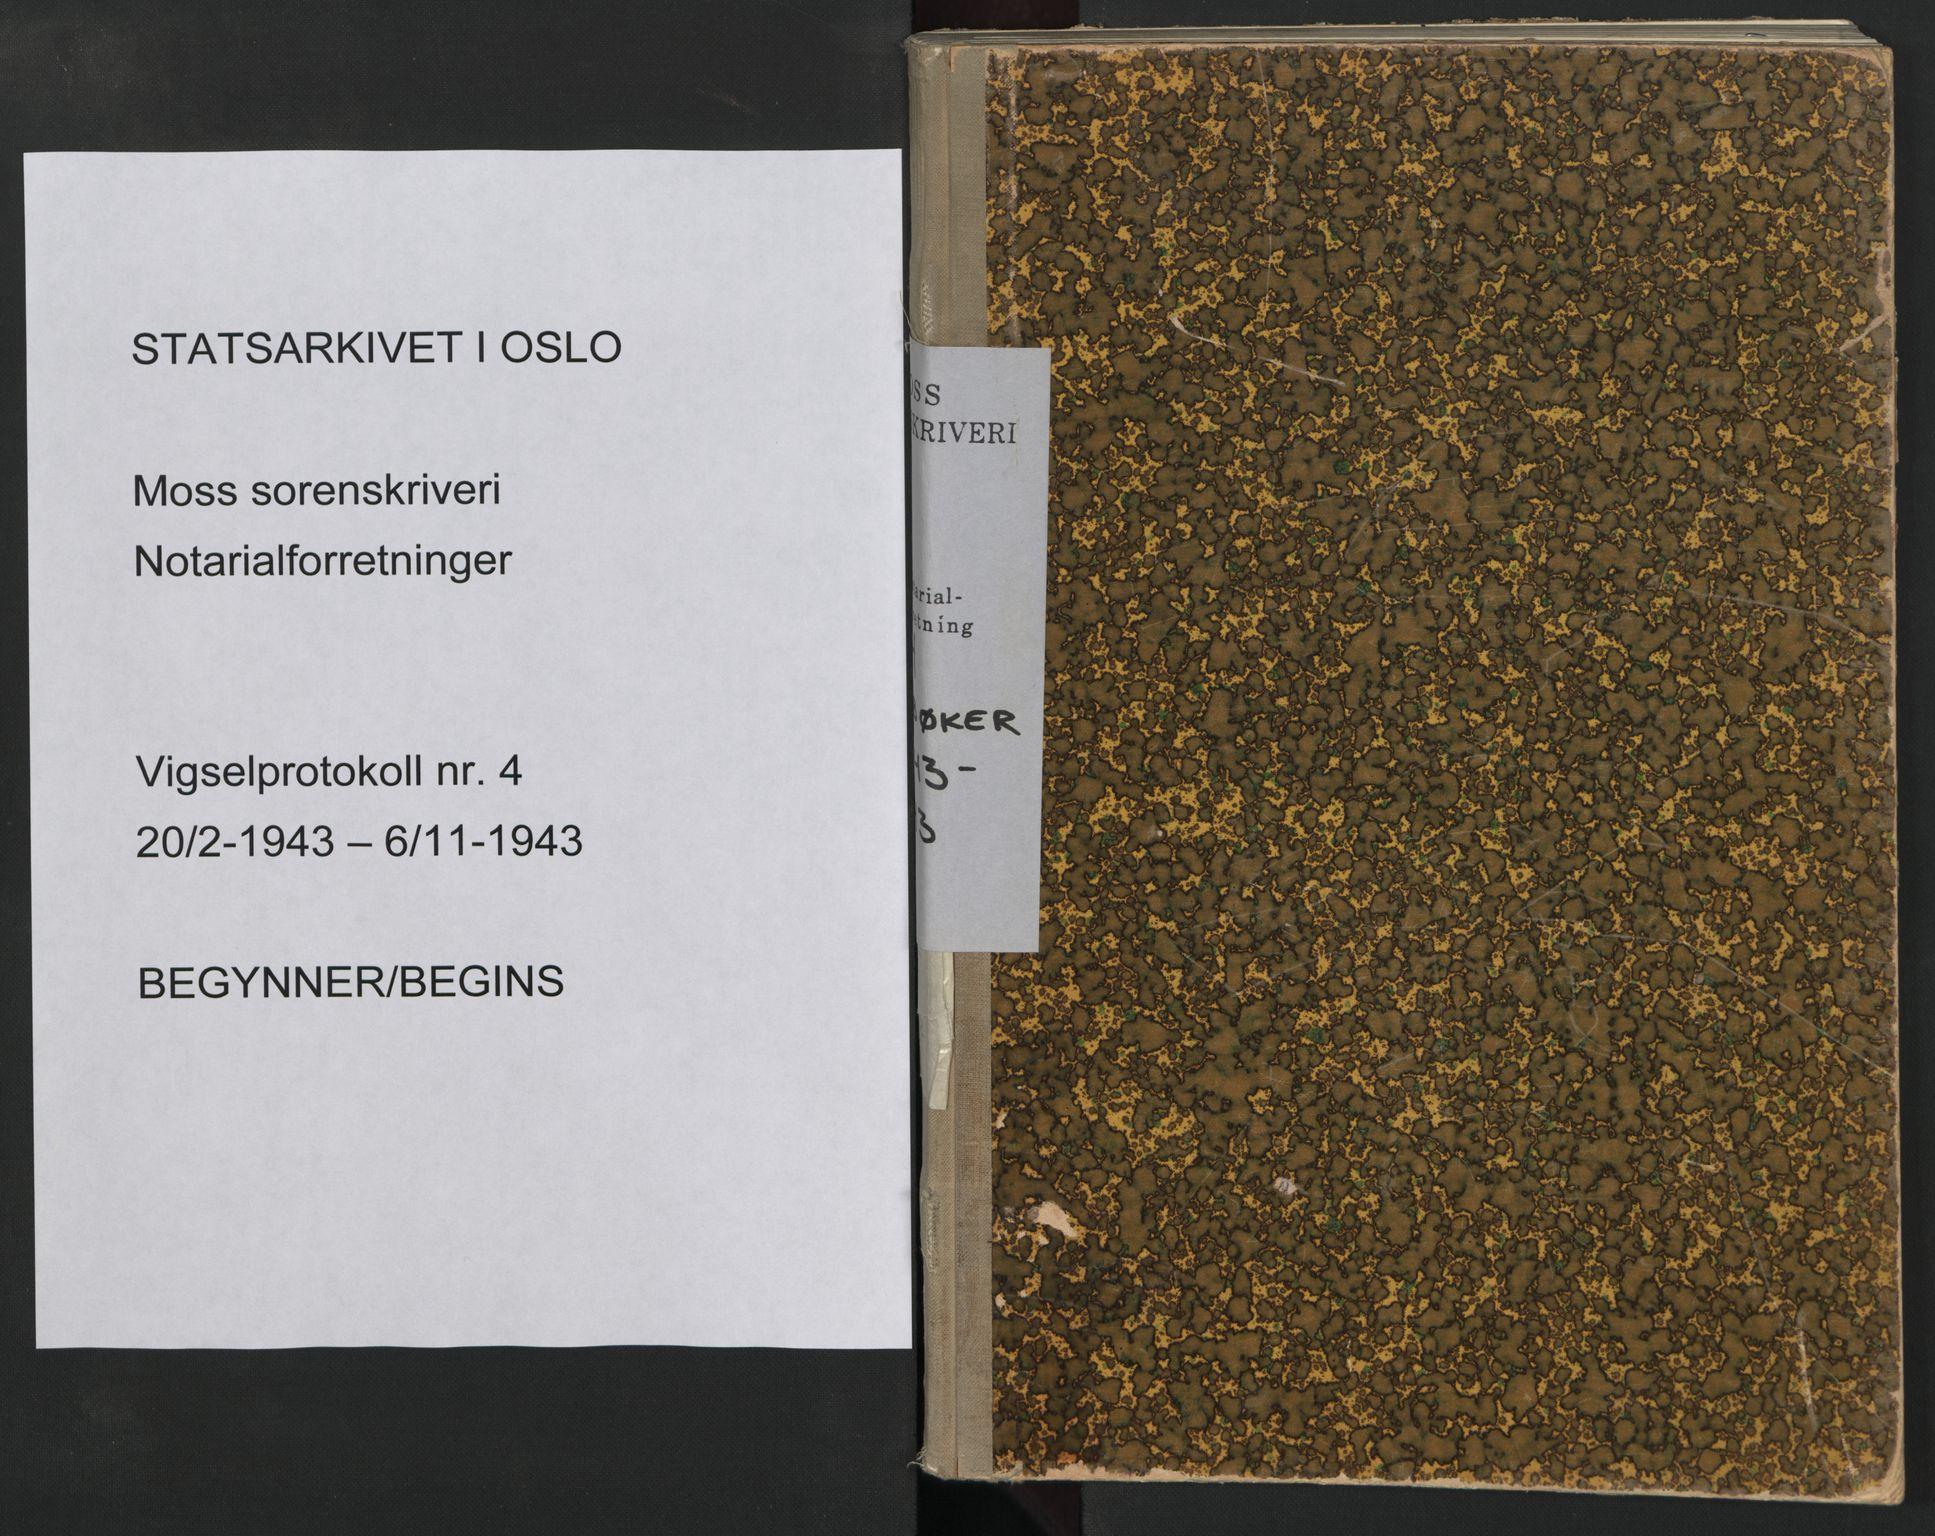 SAO, Moss sorenskriveri, 1943, s. upaginert